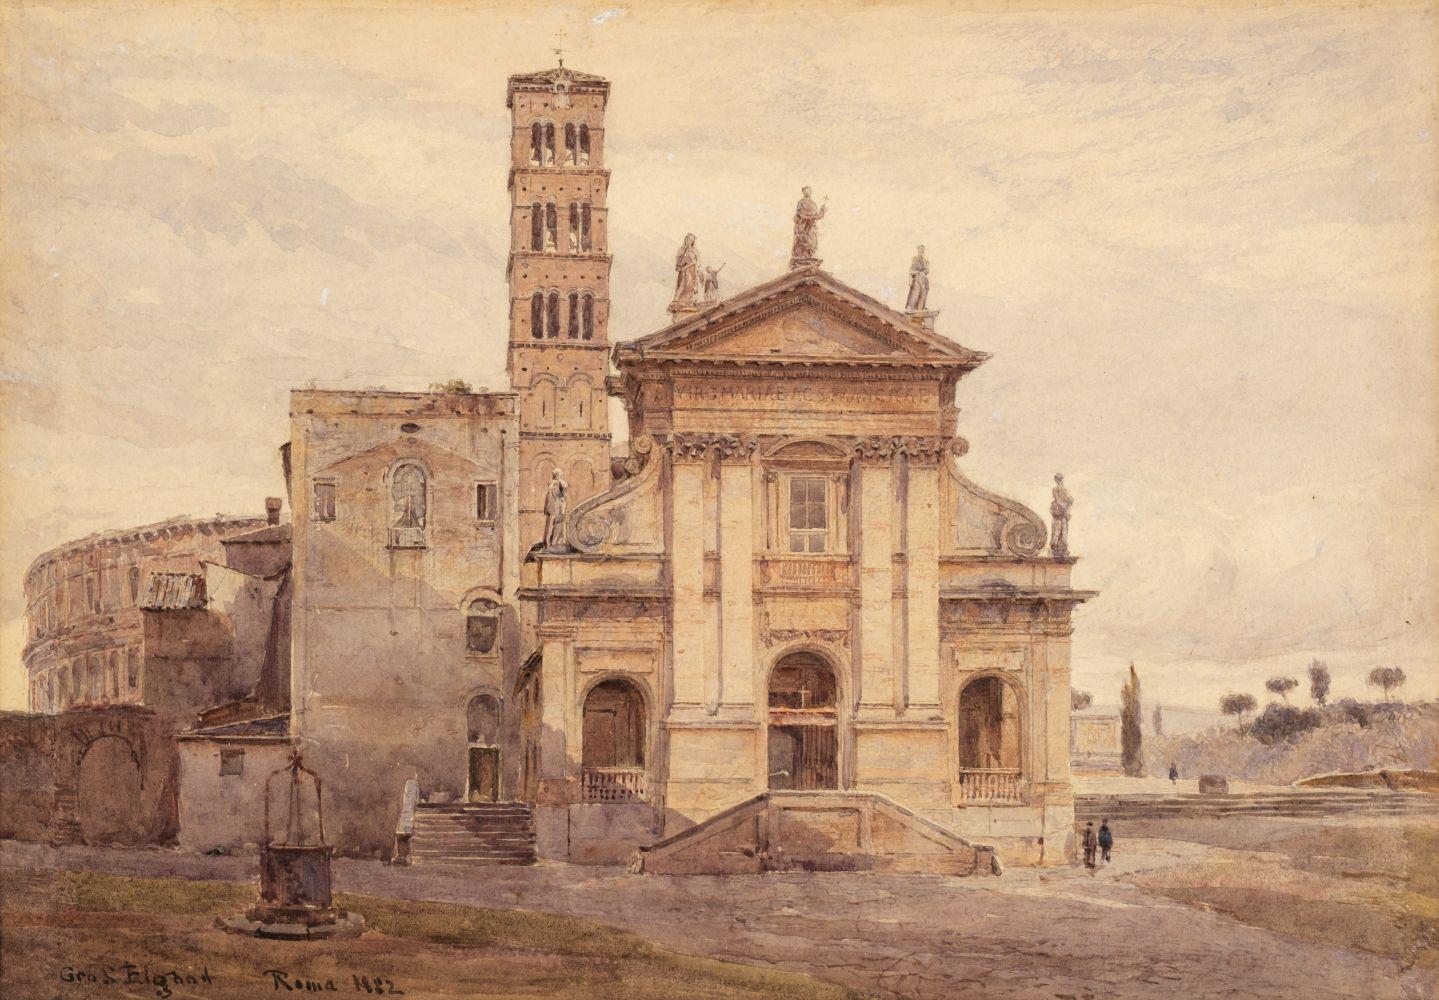 * Elgood (George S.). Basilica di Santa Francesca Romana, Rome, 1882